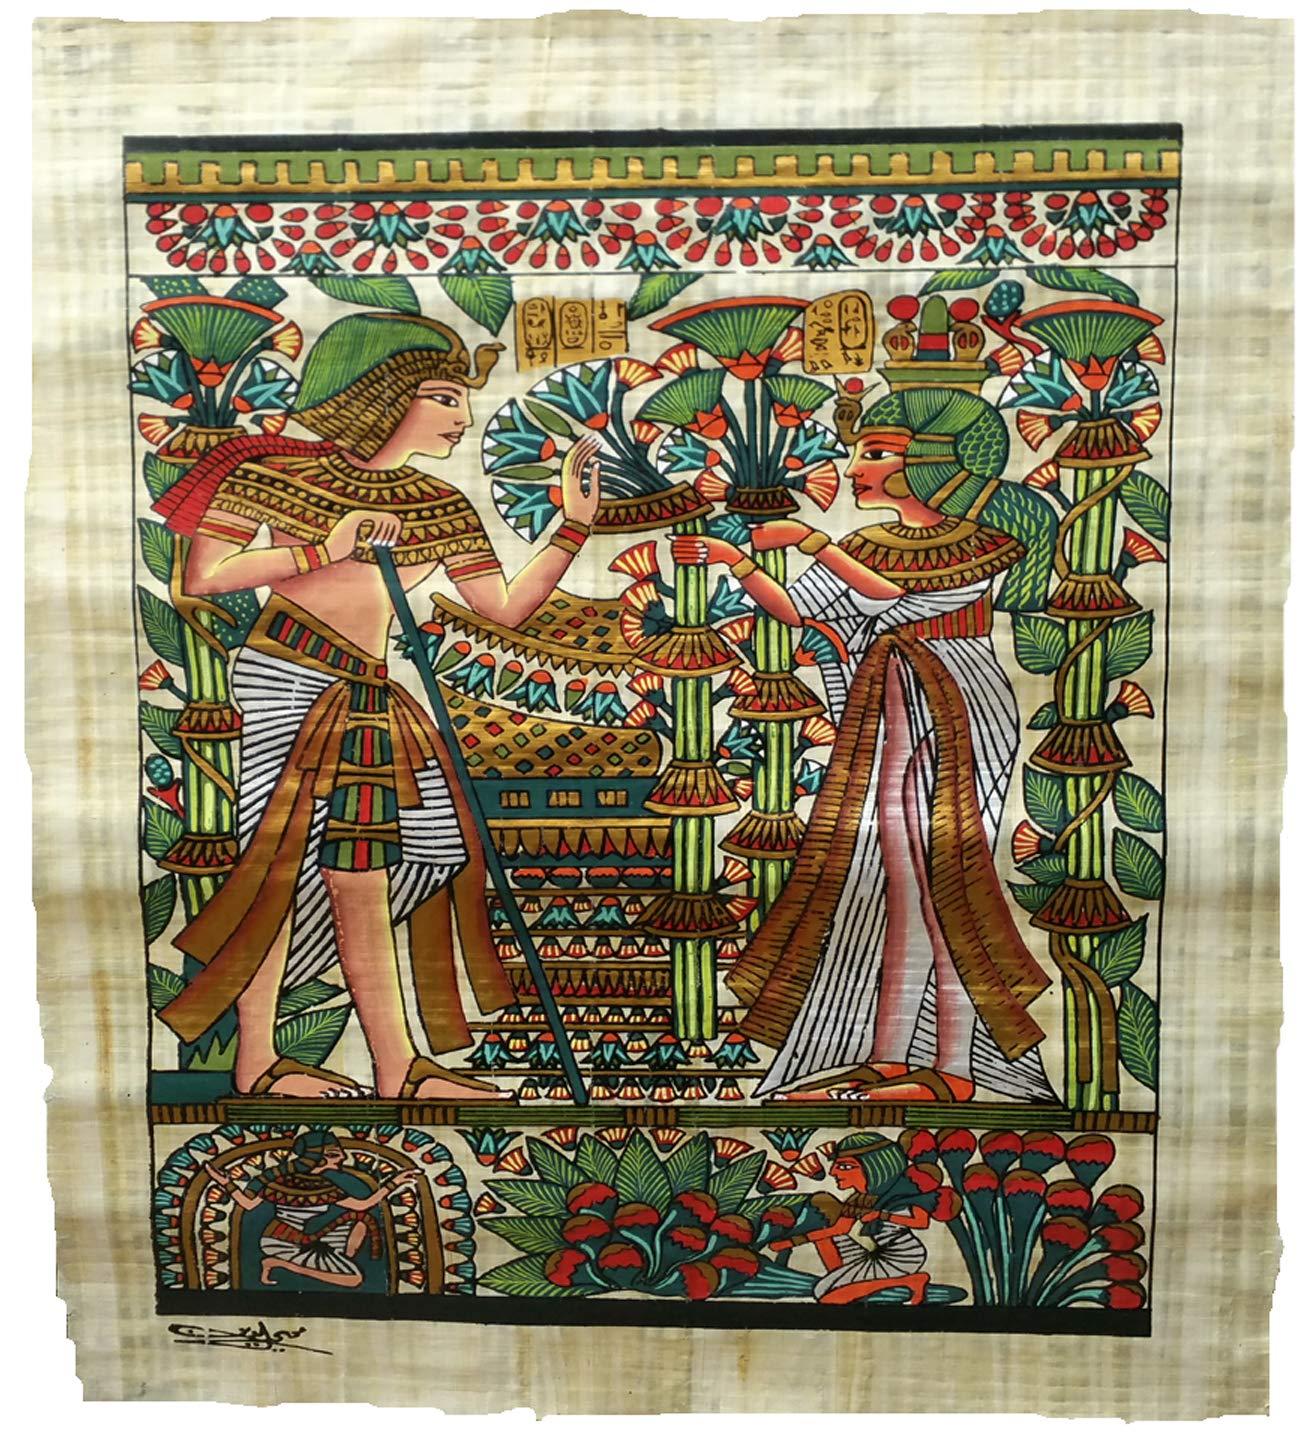 Horus Artesanía de Egipto Papiro di Tut Matrimonio Ank Amun, su Originale Papiro Fatto a Mano e Dipinto a Mano in Egitto, 60 x 90 cm HorusEgipto